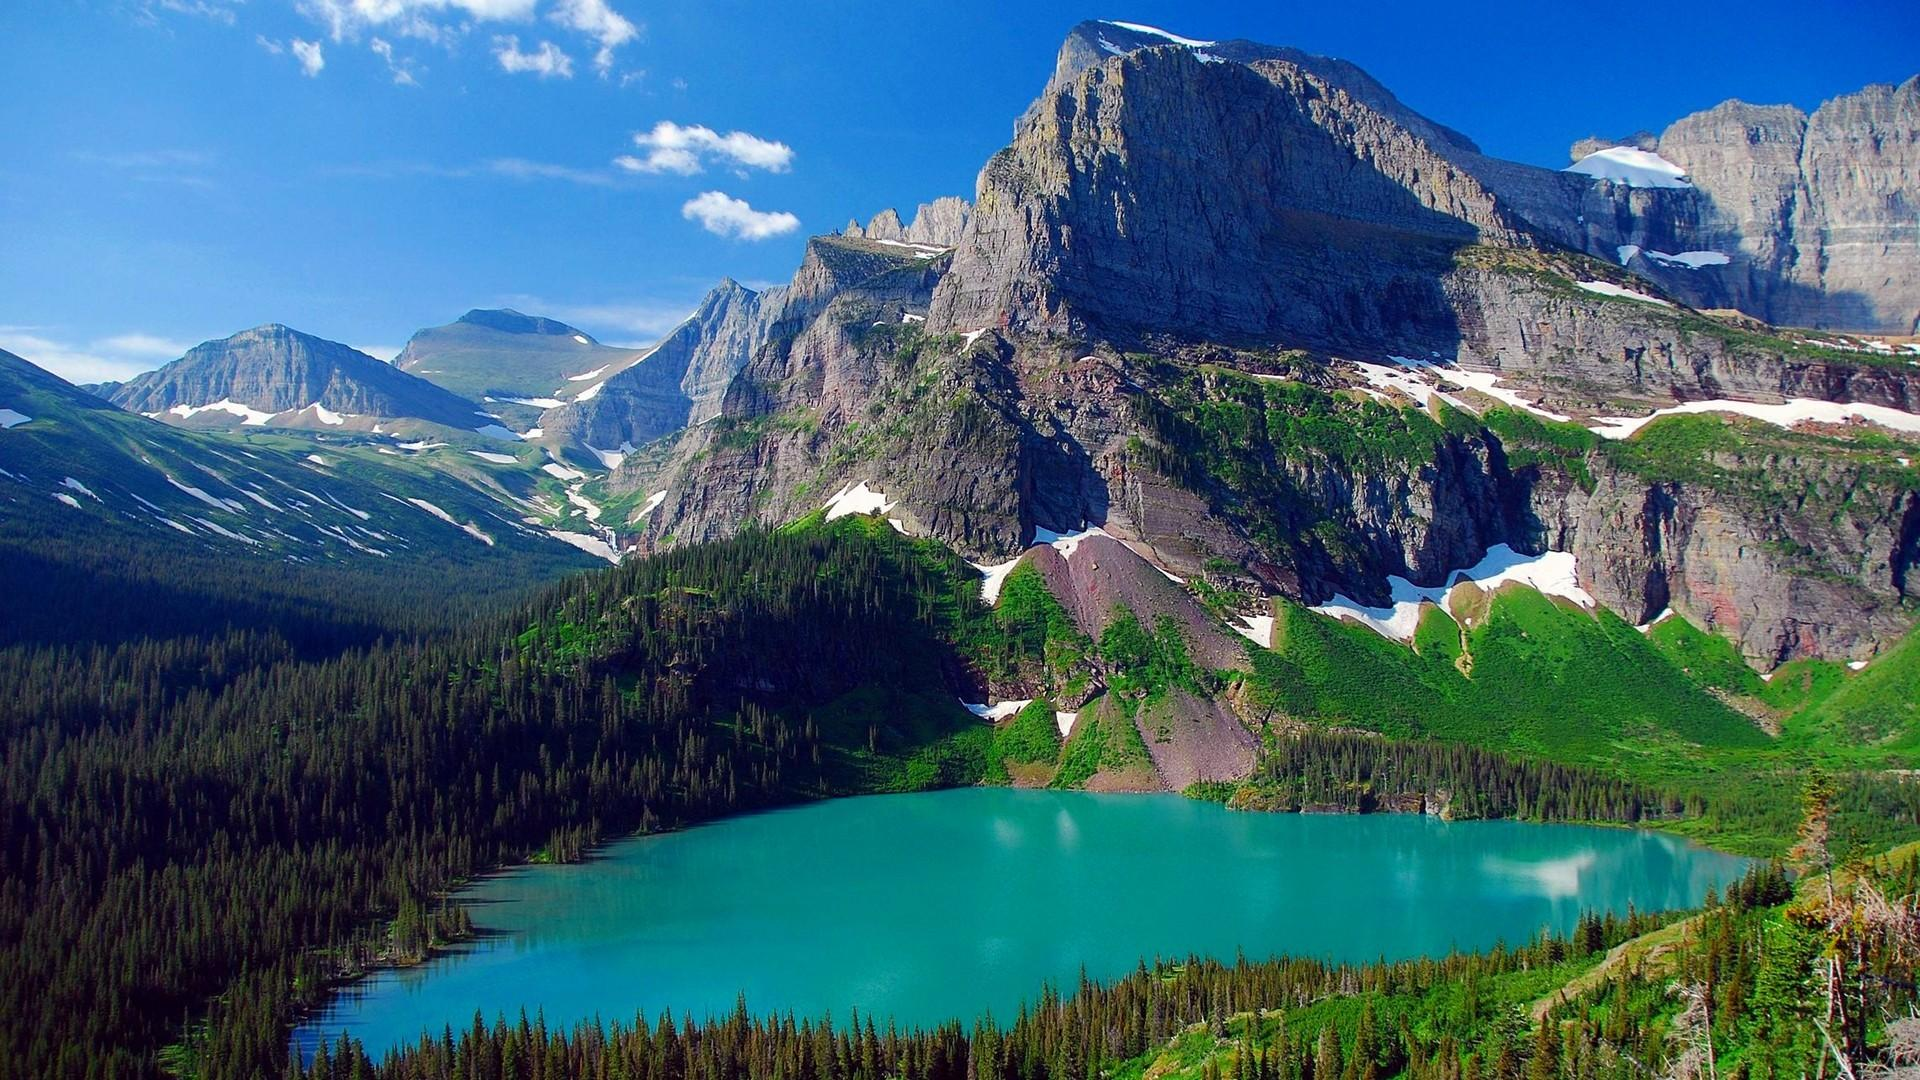 Glacier National Park Wallpapers Top Free Glacier National Park